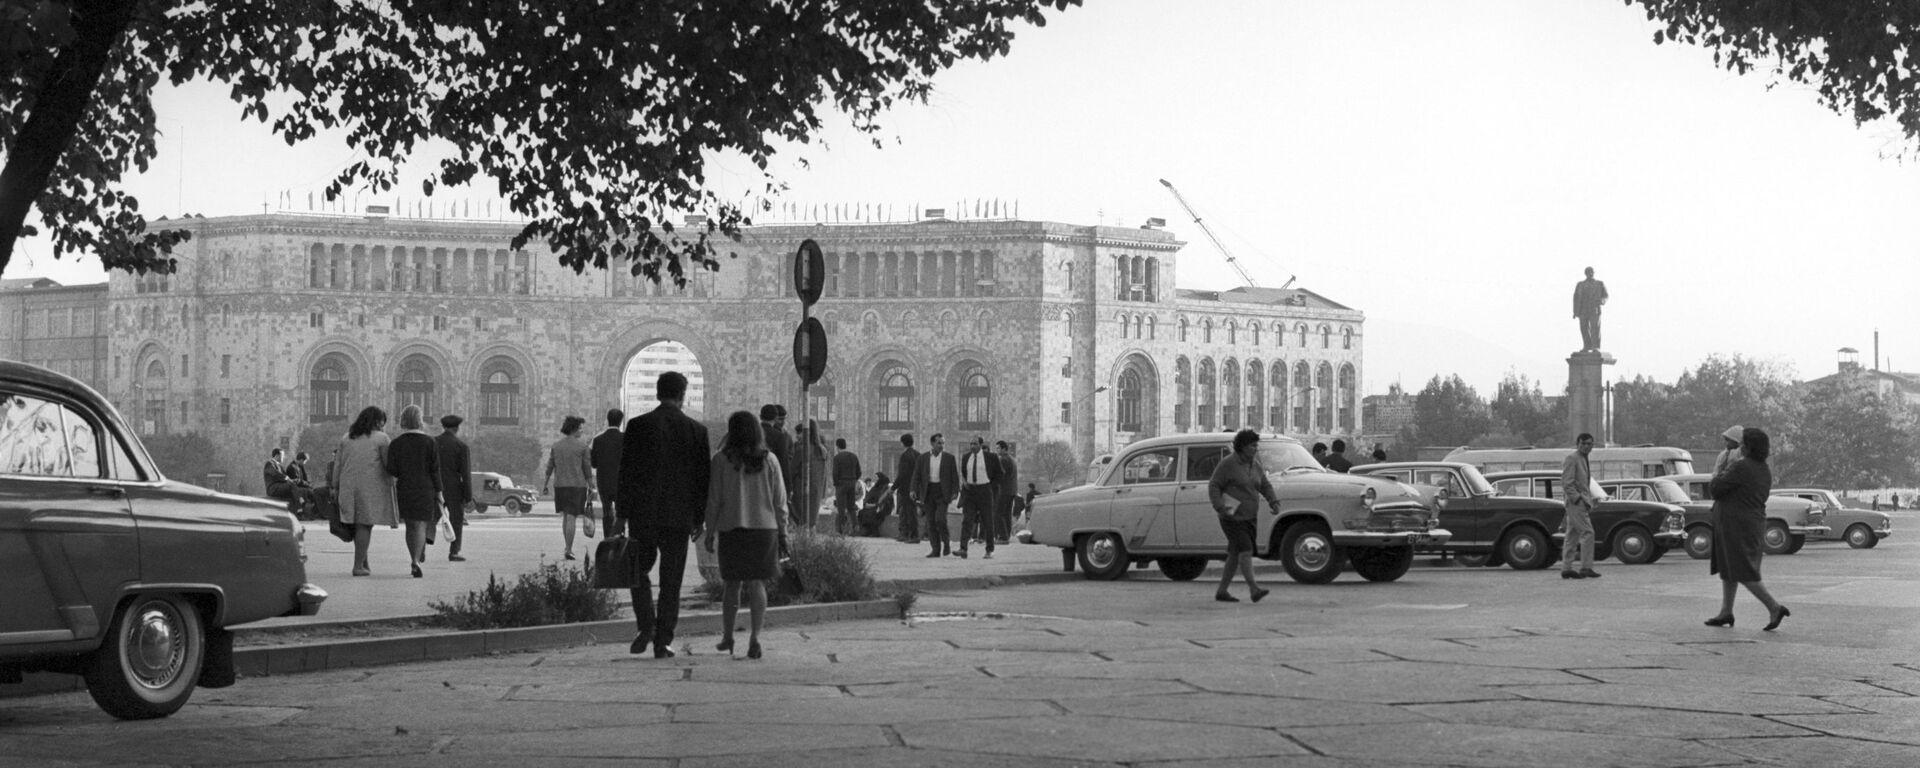 Площадь Ленина в Ереване - Sputnik Արմենիա, 1920, 07.05.2021